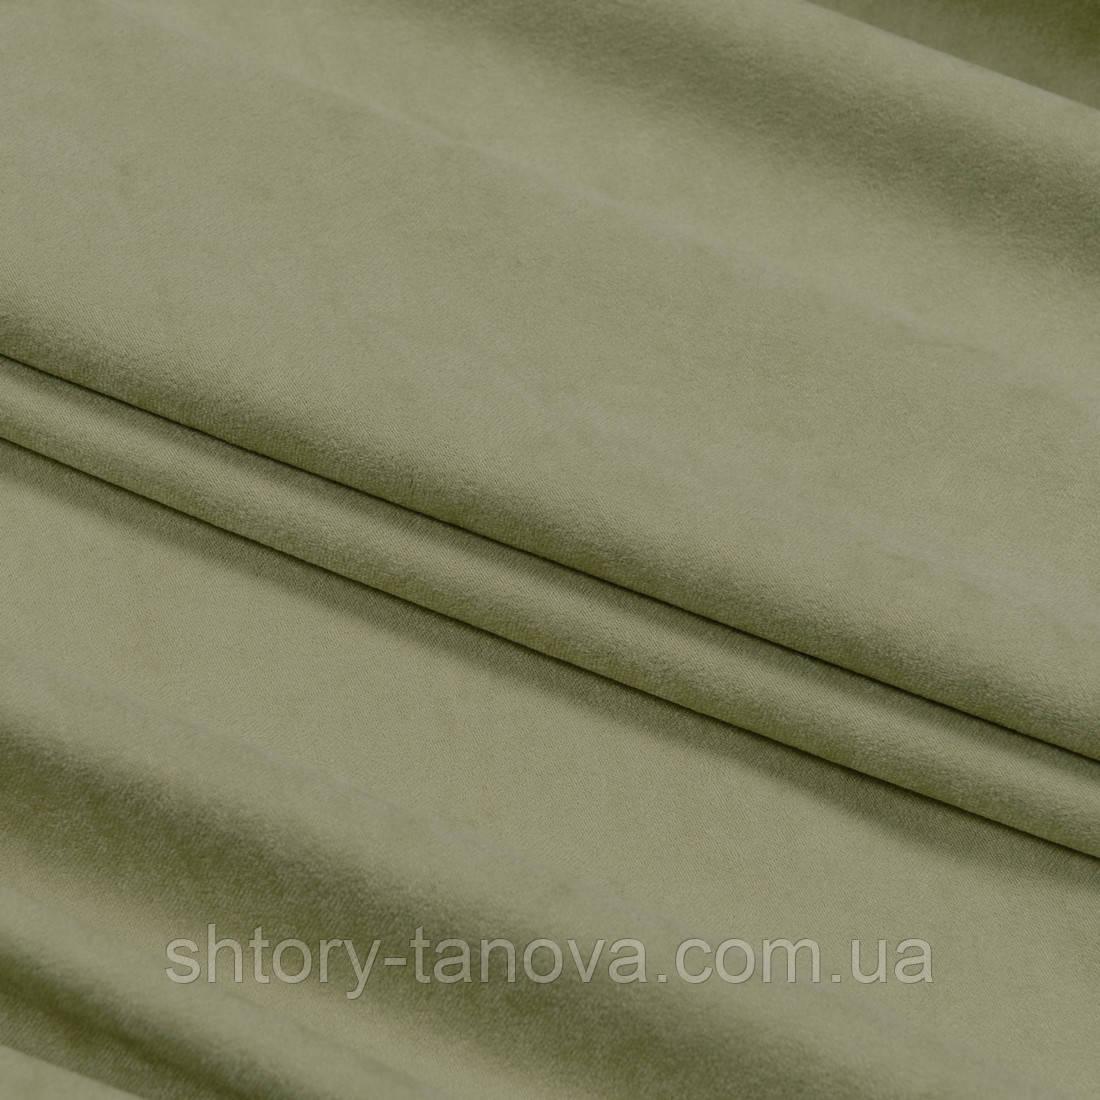 Замша для штор и декора зеленая оливка